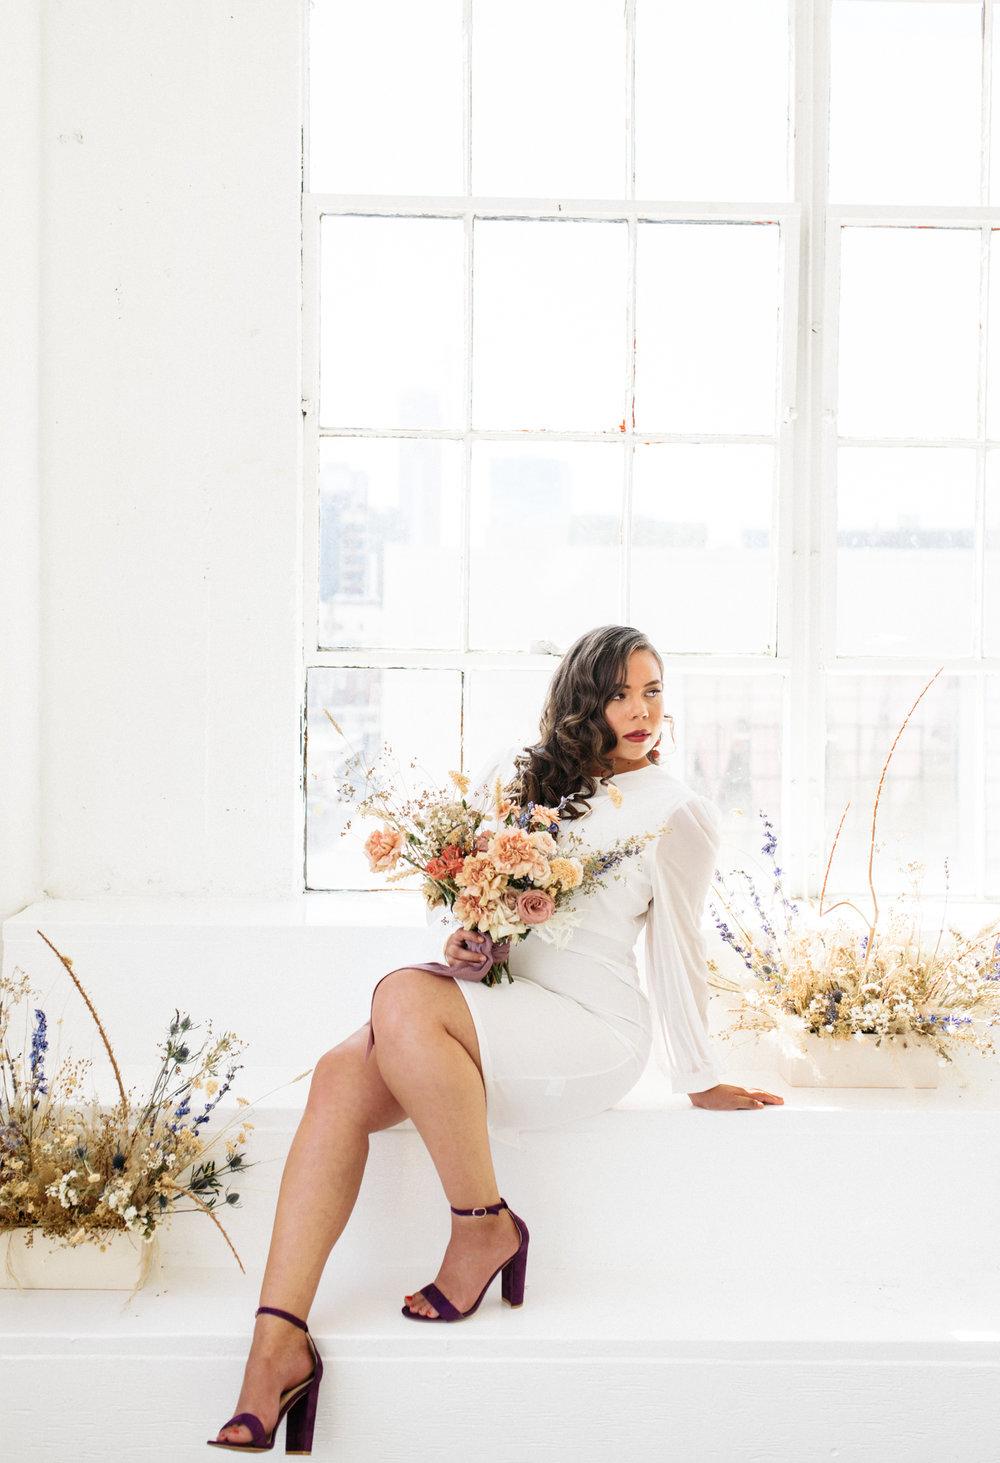 SamErica Studios - Lavender Lemonade Modern Bridal Editorial -27.jpg